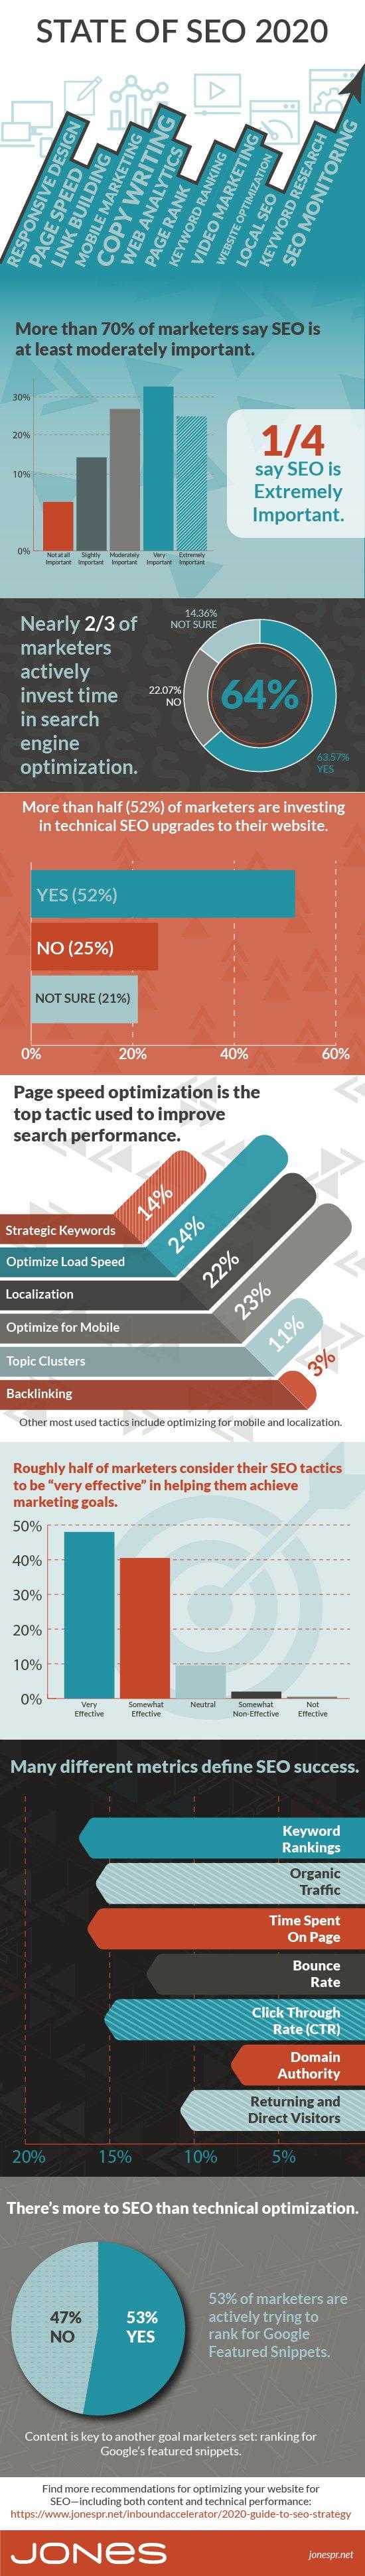 jones-infographic-SEO-strategy-statistics-2020